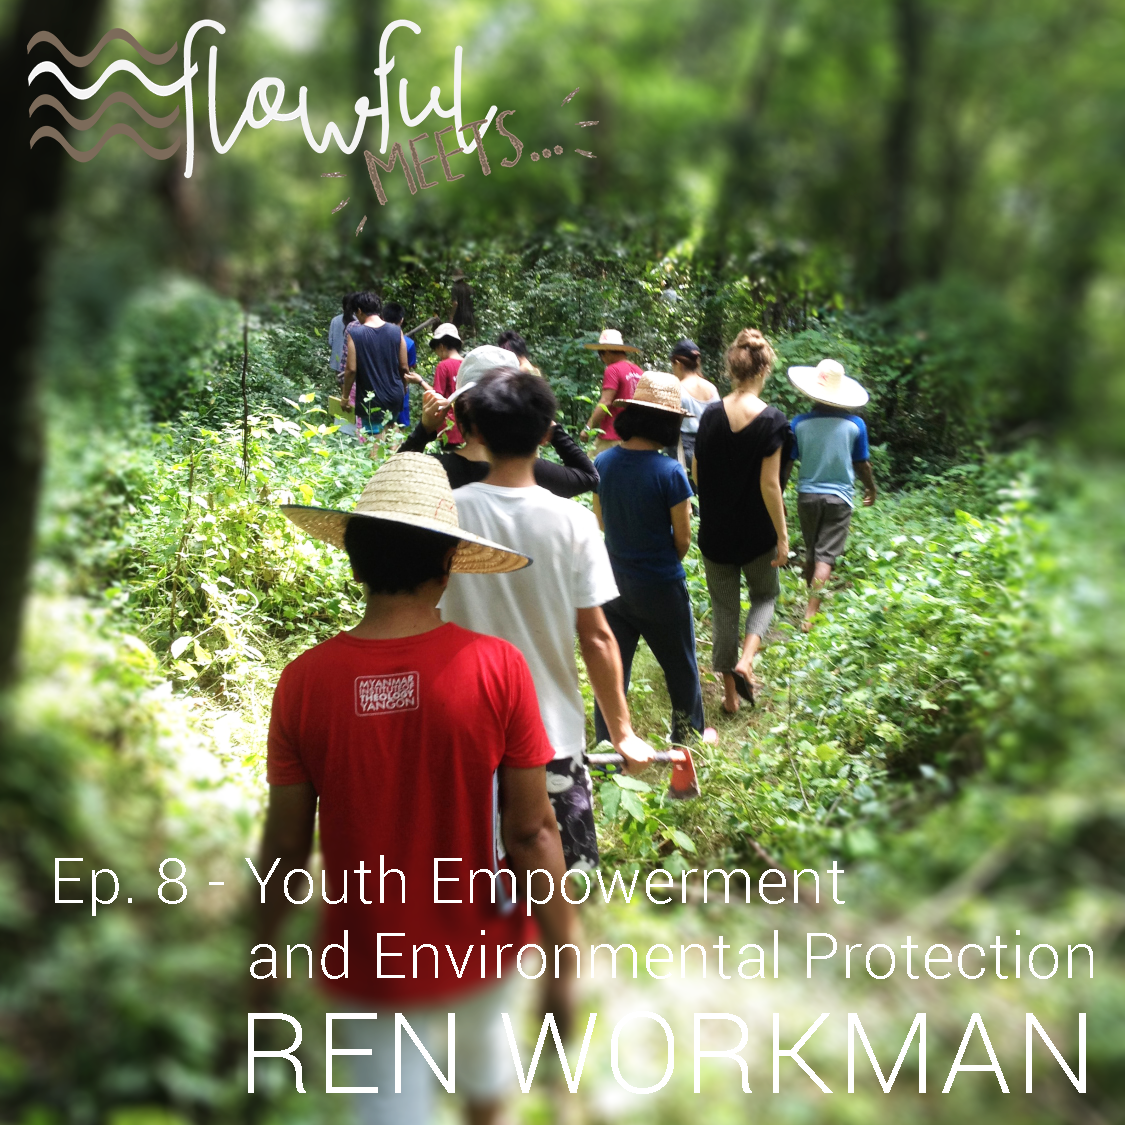 flowful meets Ren Workman youth empowerment